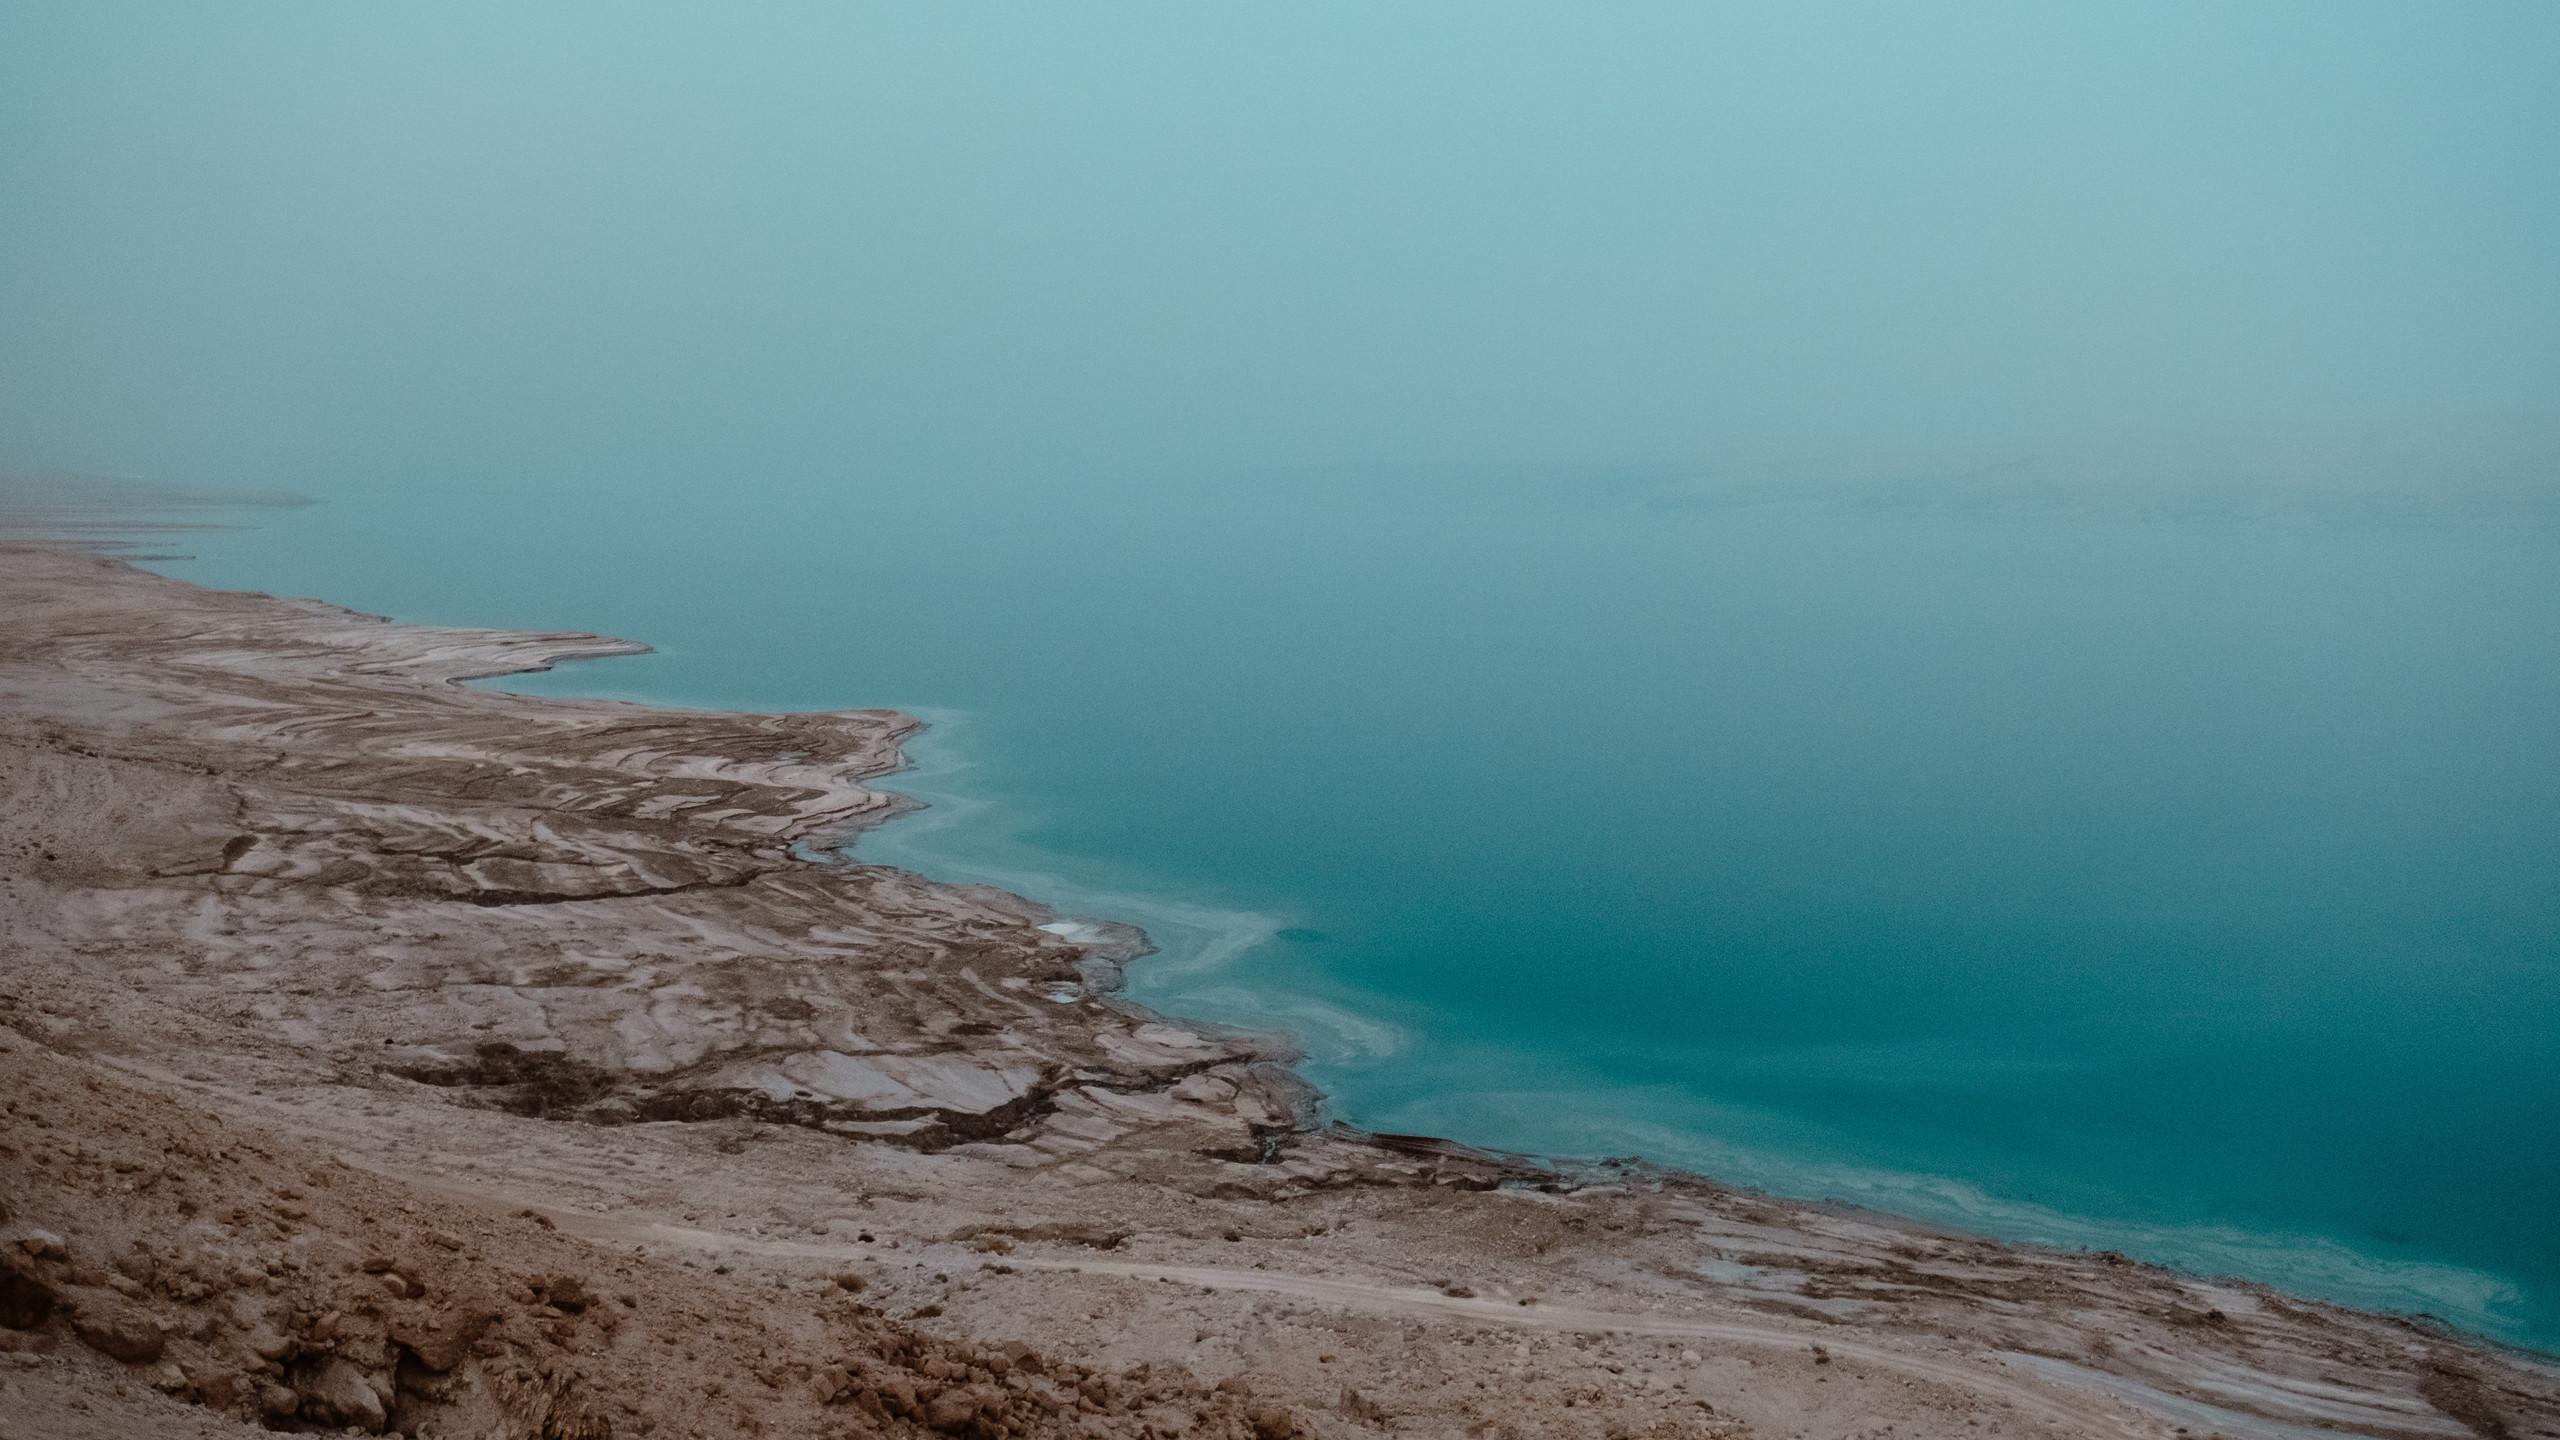 Pablo Heimplatz Dead Sea